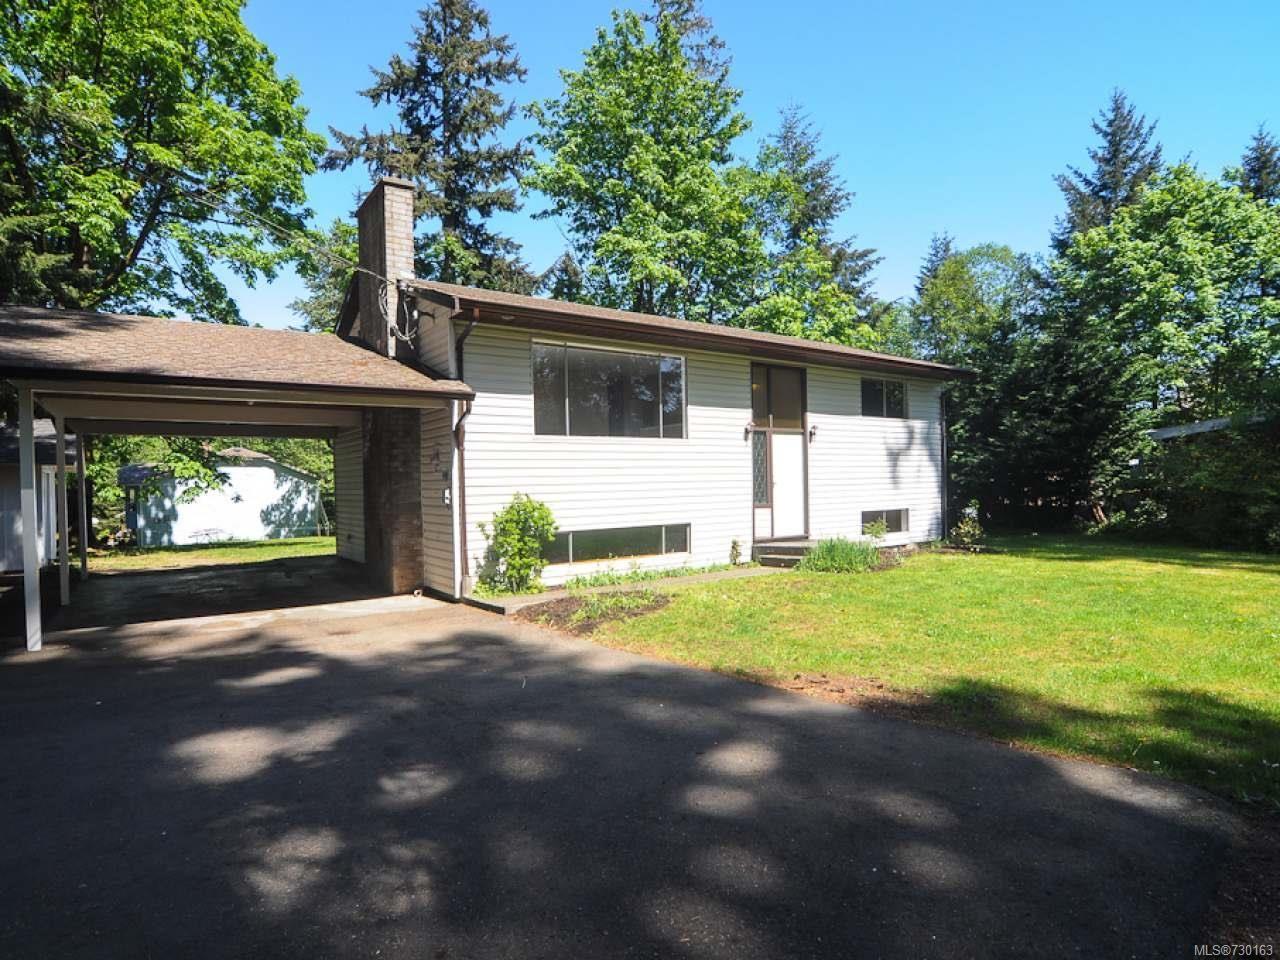 Main Photo: 8662 Whelan Rd in MERVILLE: CV Merville Black Creek House for sale (Comox Valley)  : MLS®# 730163